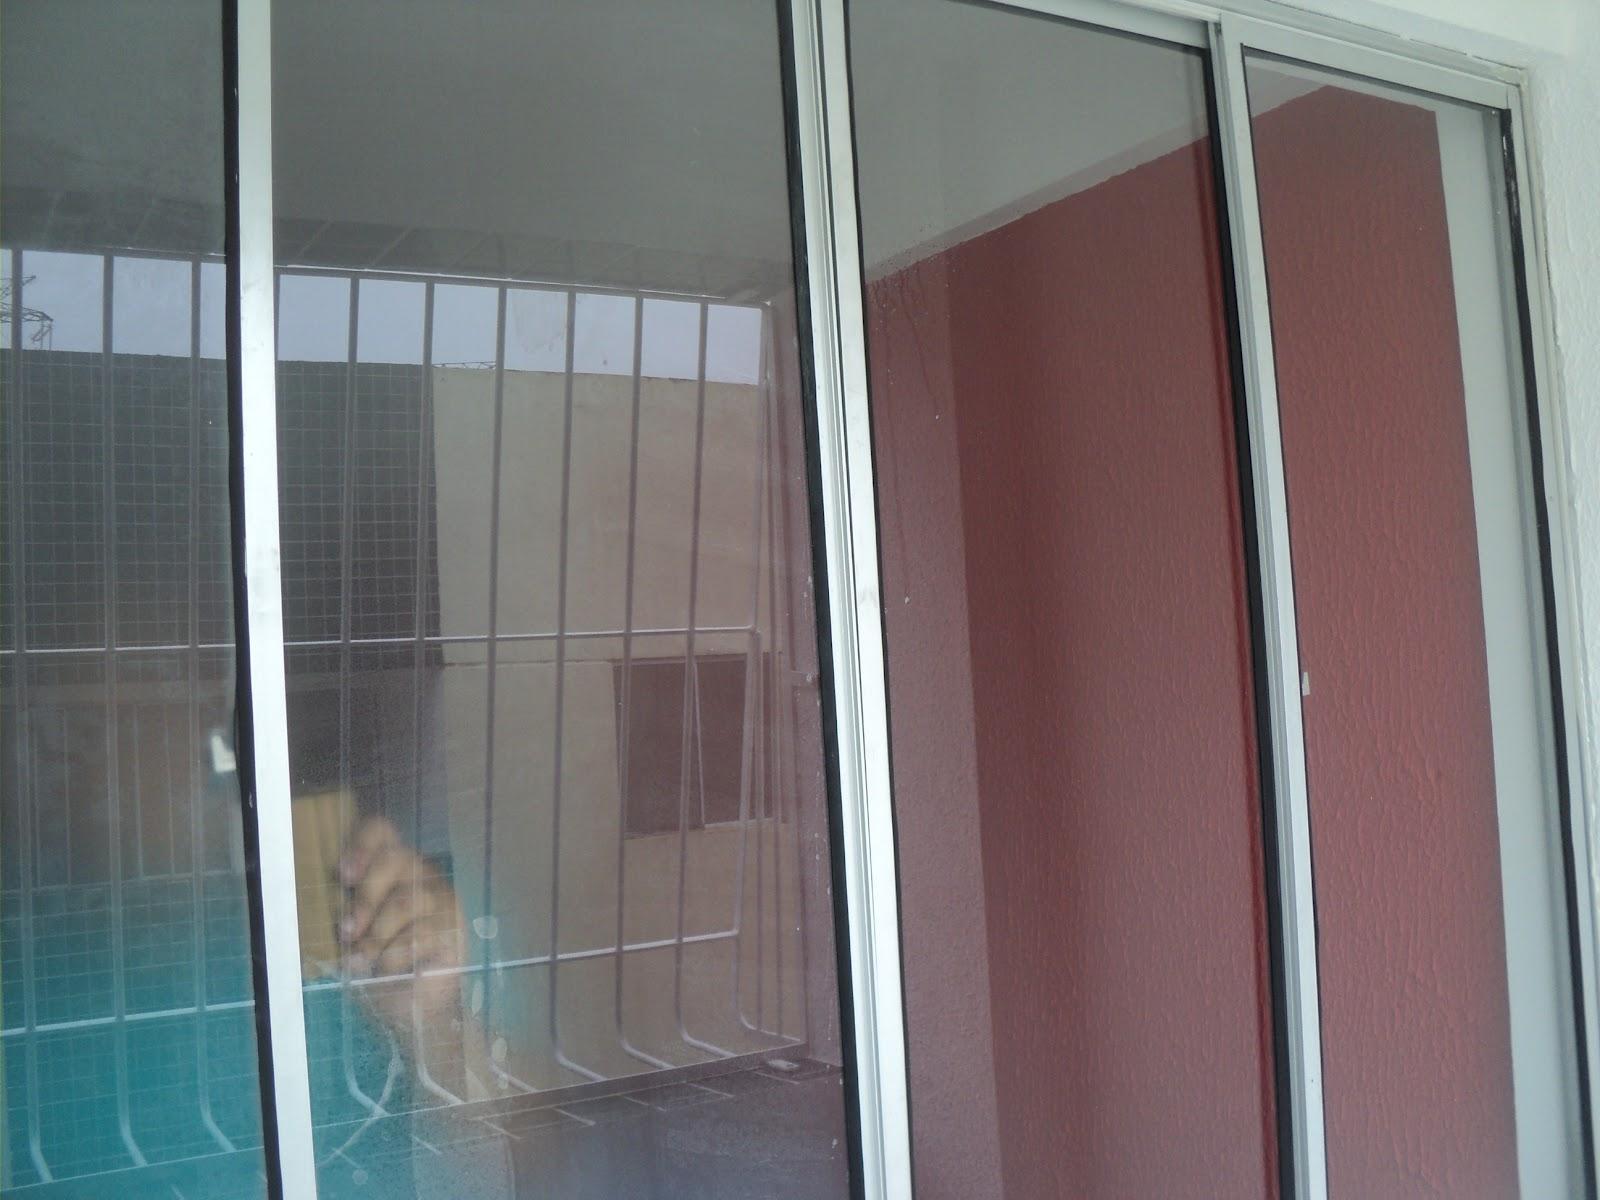 #436970 adesivo jateado em janela (efeito de vidro fosco) em Camaragibe 732 Janelas Vidro Fosco